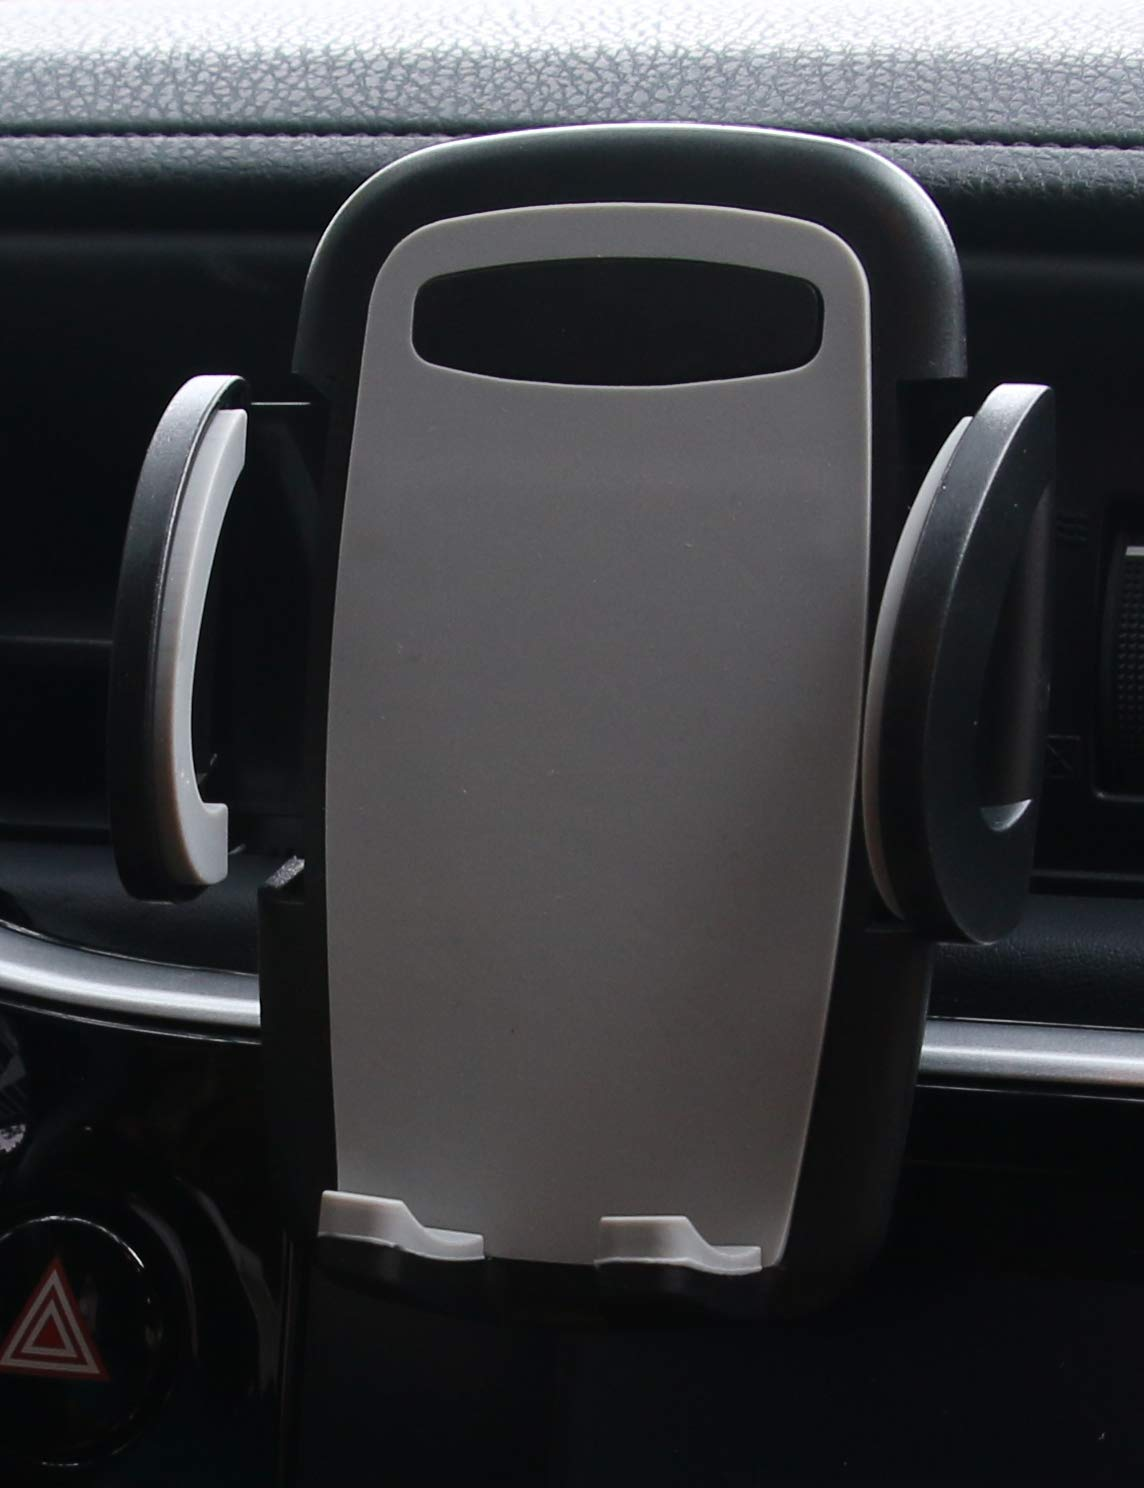 Belumans Universal Smartphone Car Air Black Vent Mount Holder Cradle Compatible with iPhone X 8 8 Plus 7 7 Plus SE 6s 6 Plus 6 5s 5 4s 4 Samsung Galaxy S6 S5 S4 LG